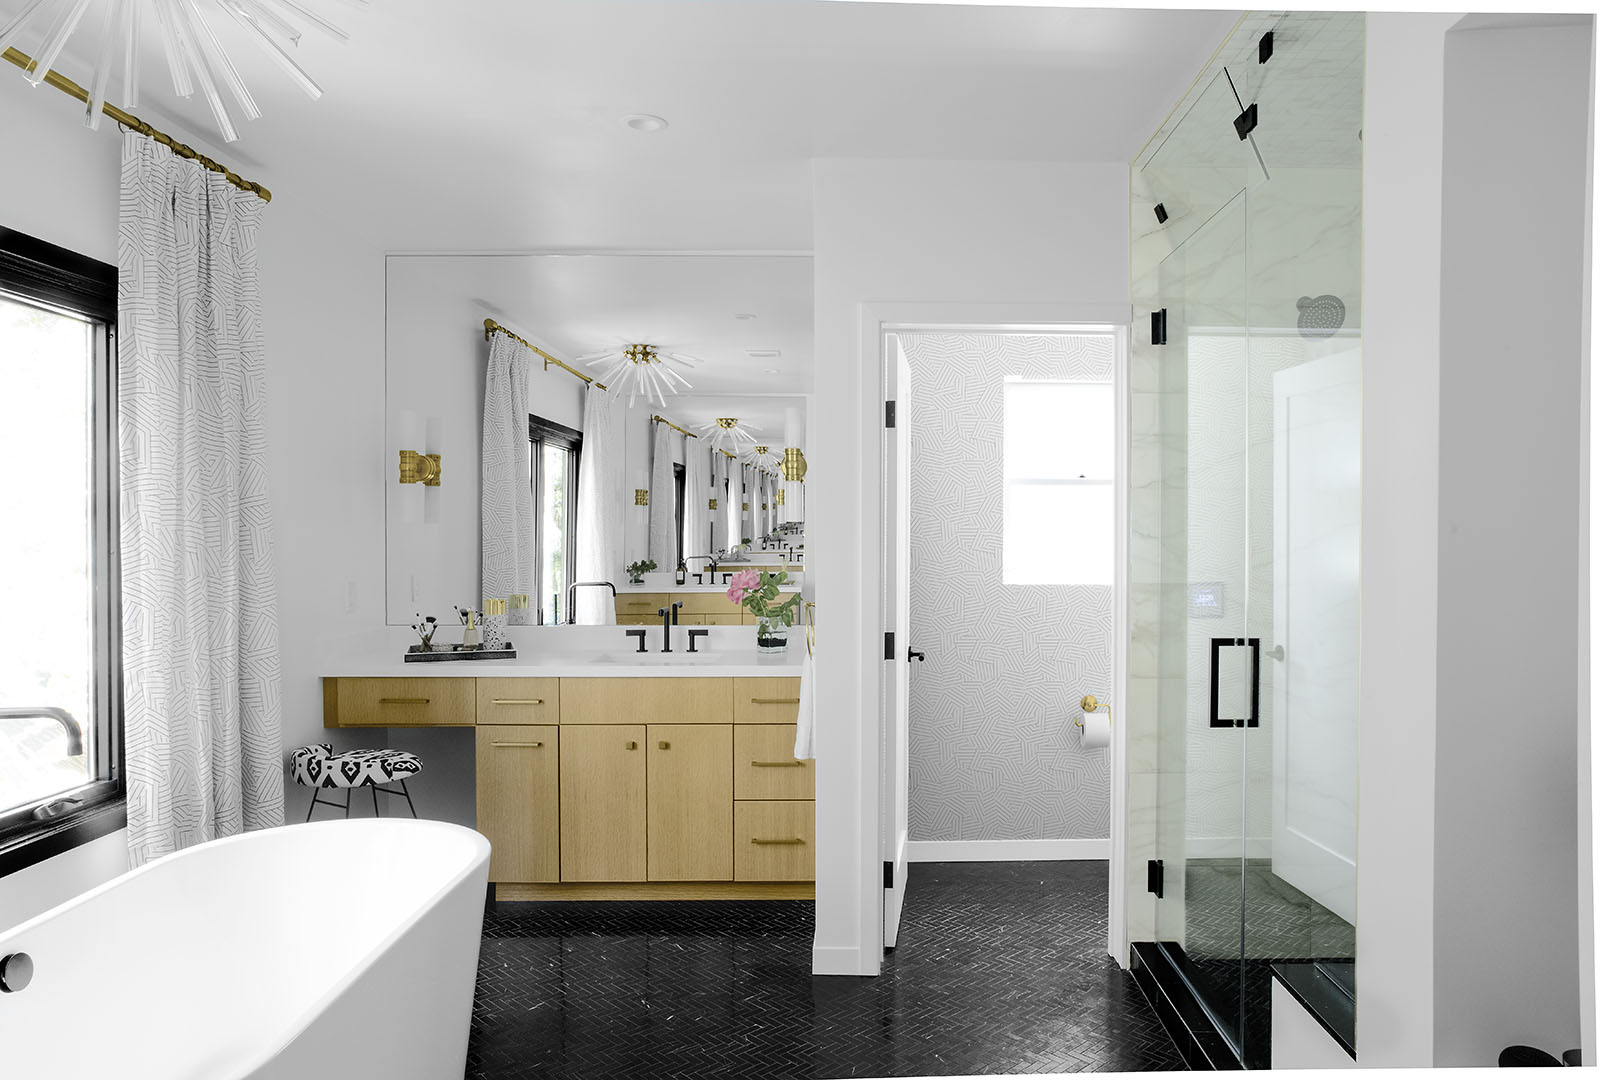 Bathroom interior design in Oakland, CA